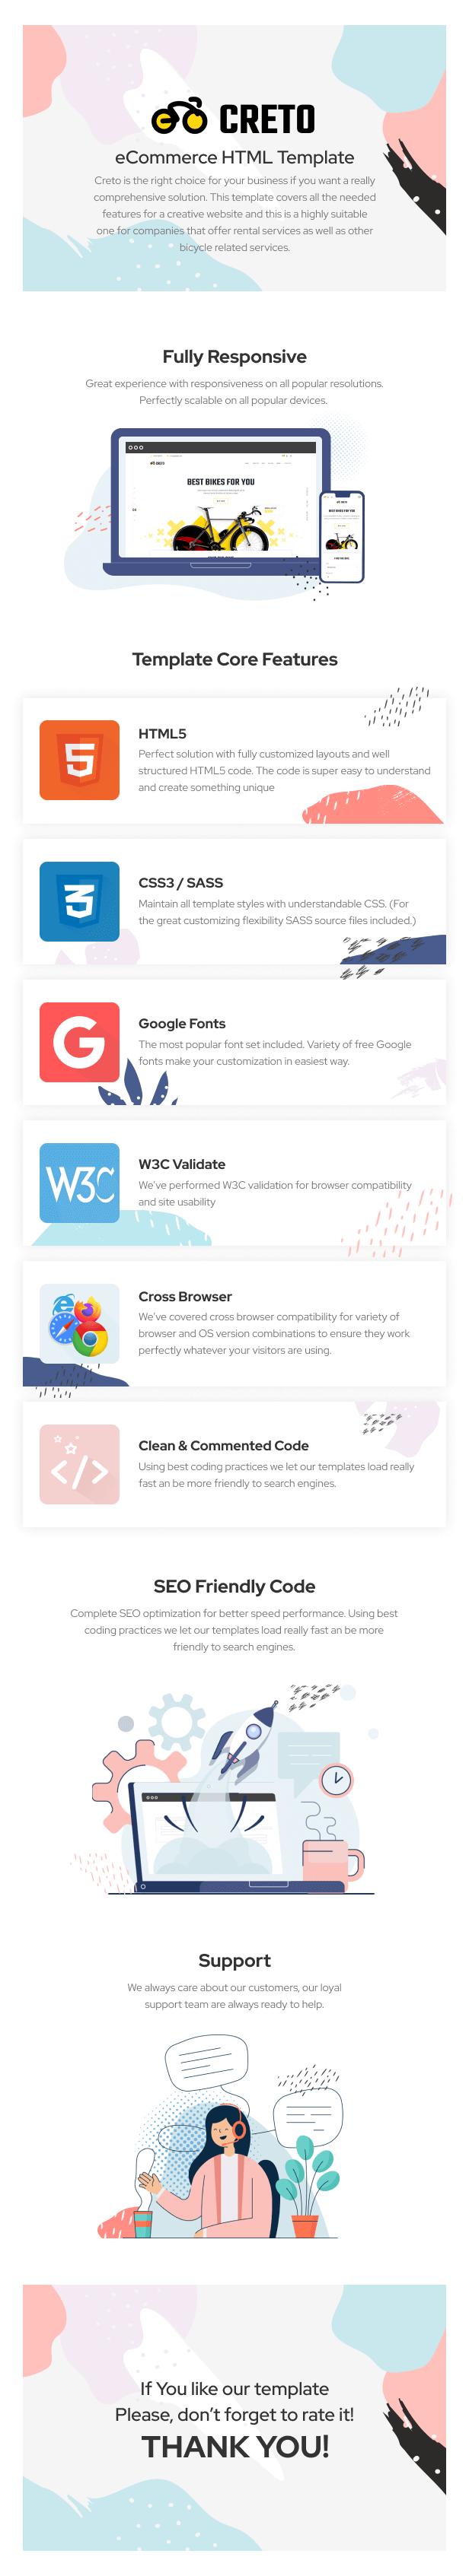 Creto   eCommerce HTML Template - 5